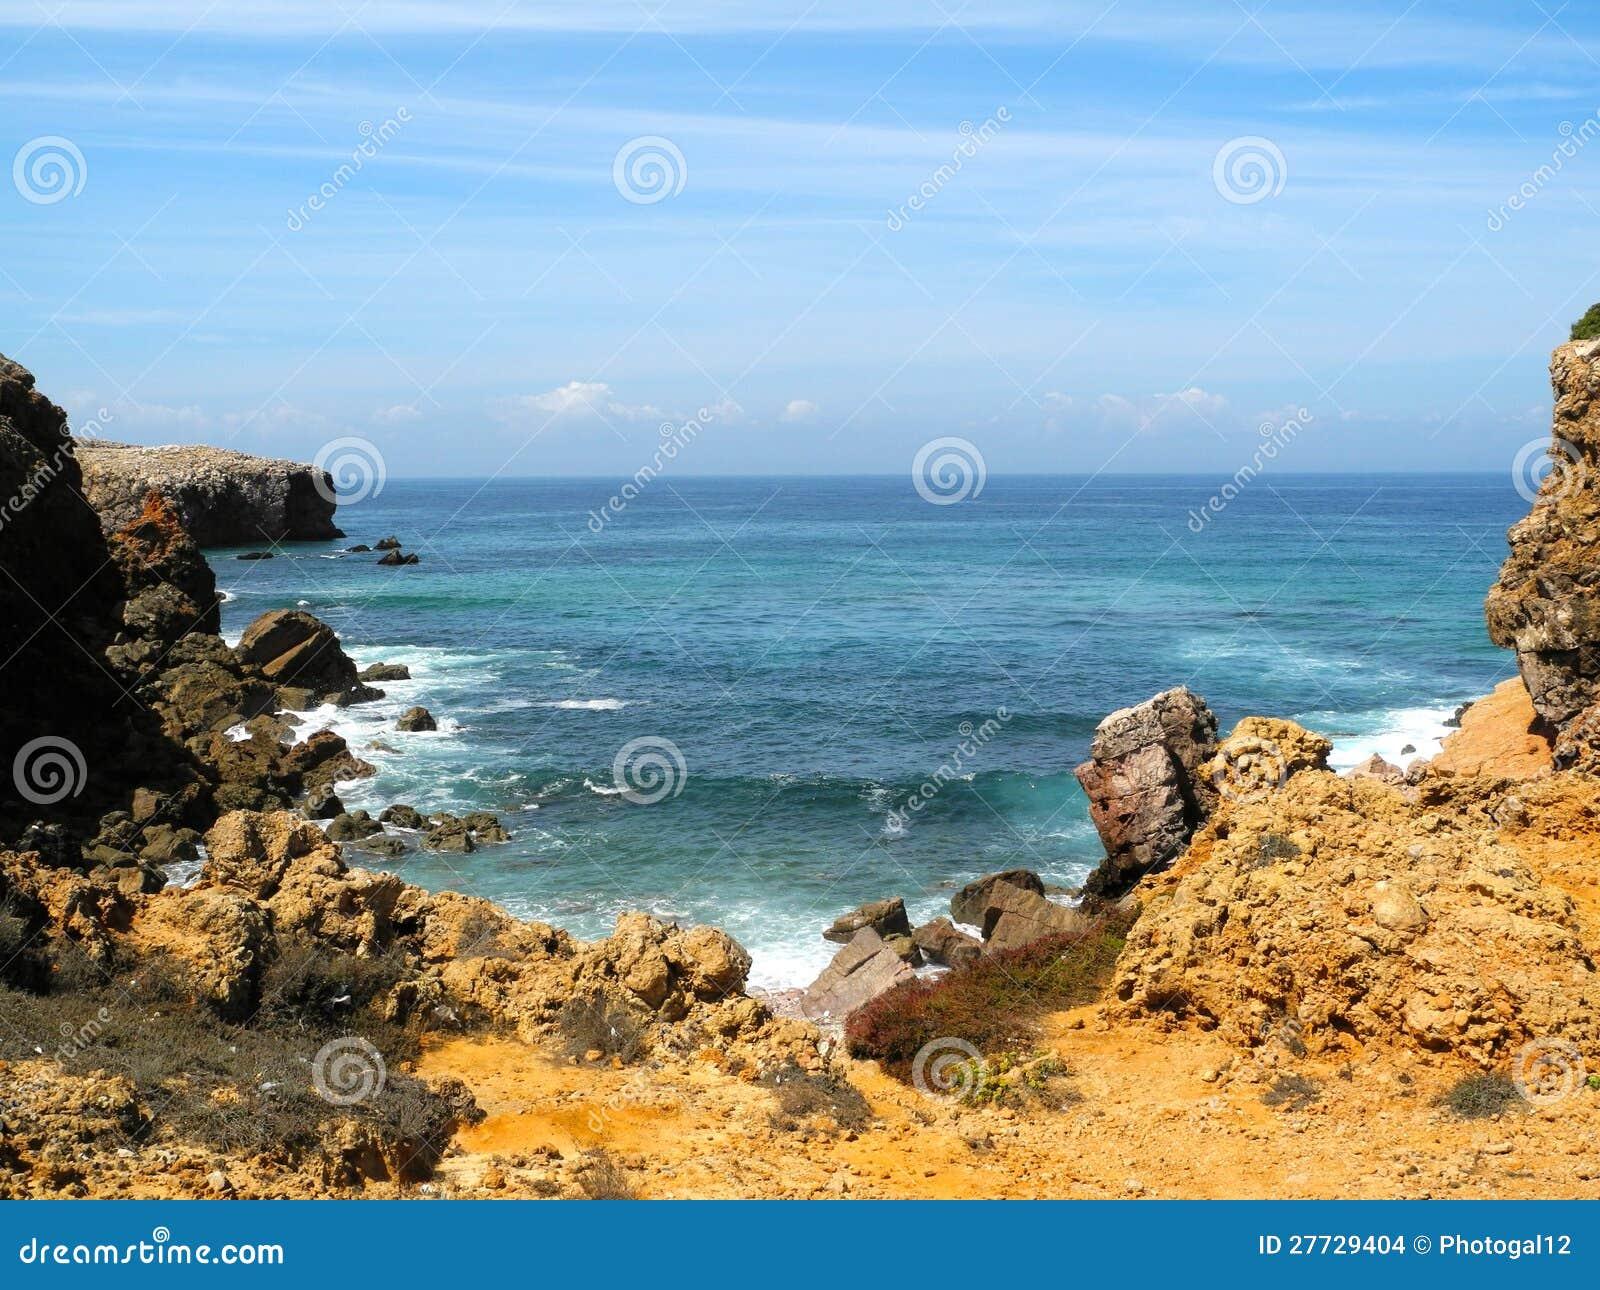 Ein felsiger Klippen-Strand